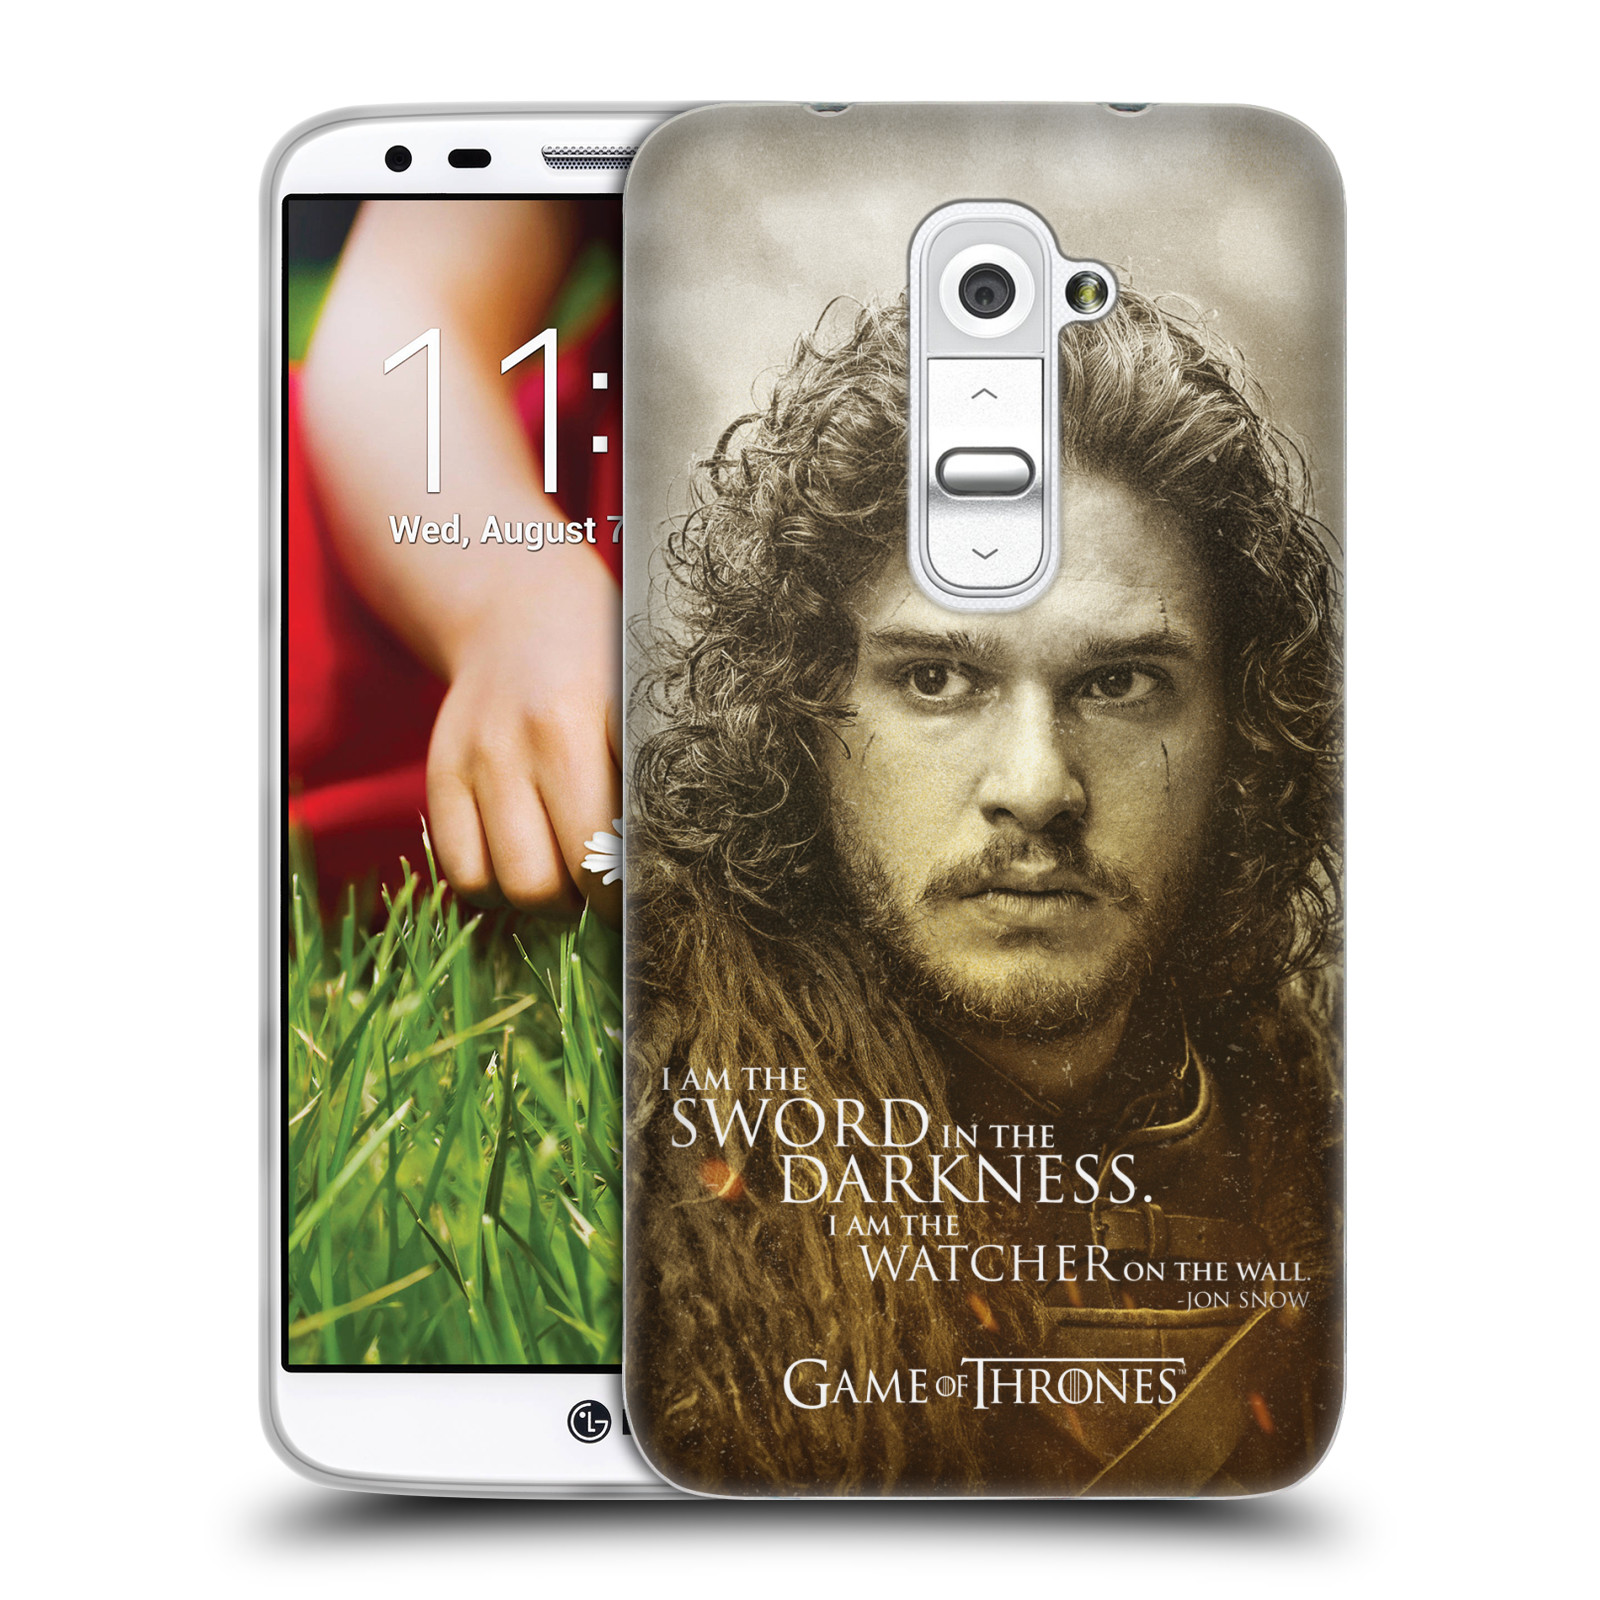 Silikonové pouzdro na mobil HTC LG G2 HEAD CASE Hra o trůny - Jon Snow (Silikonový kryt či obal na mobilní telefon s licencovaným motivem Hra o trůny - Game Of Thrones pro HTC LG G2)